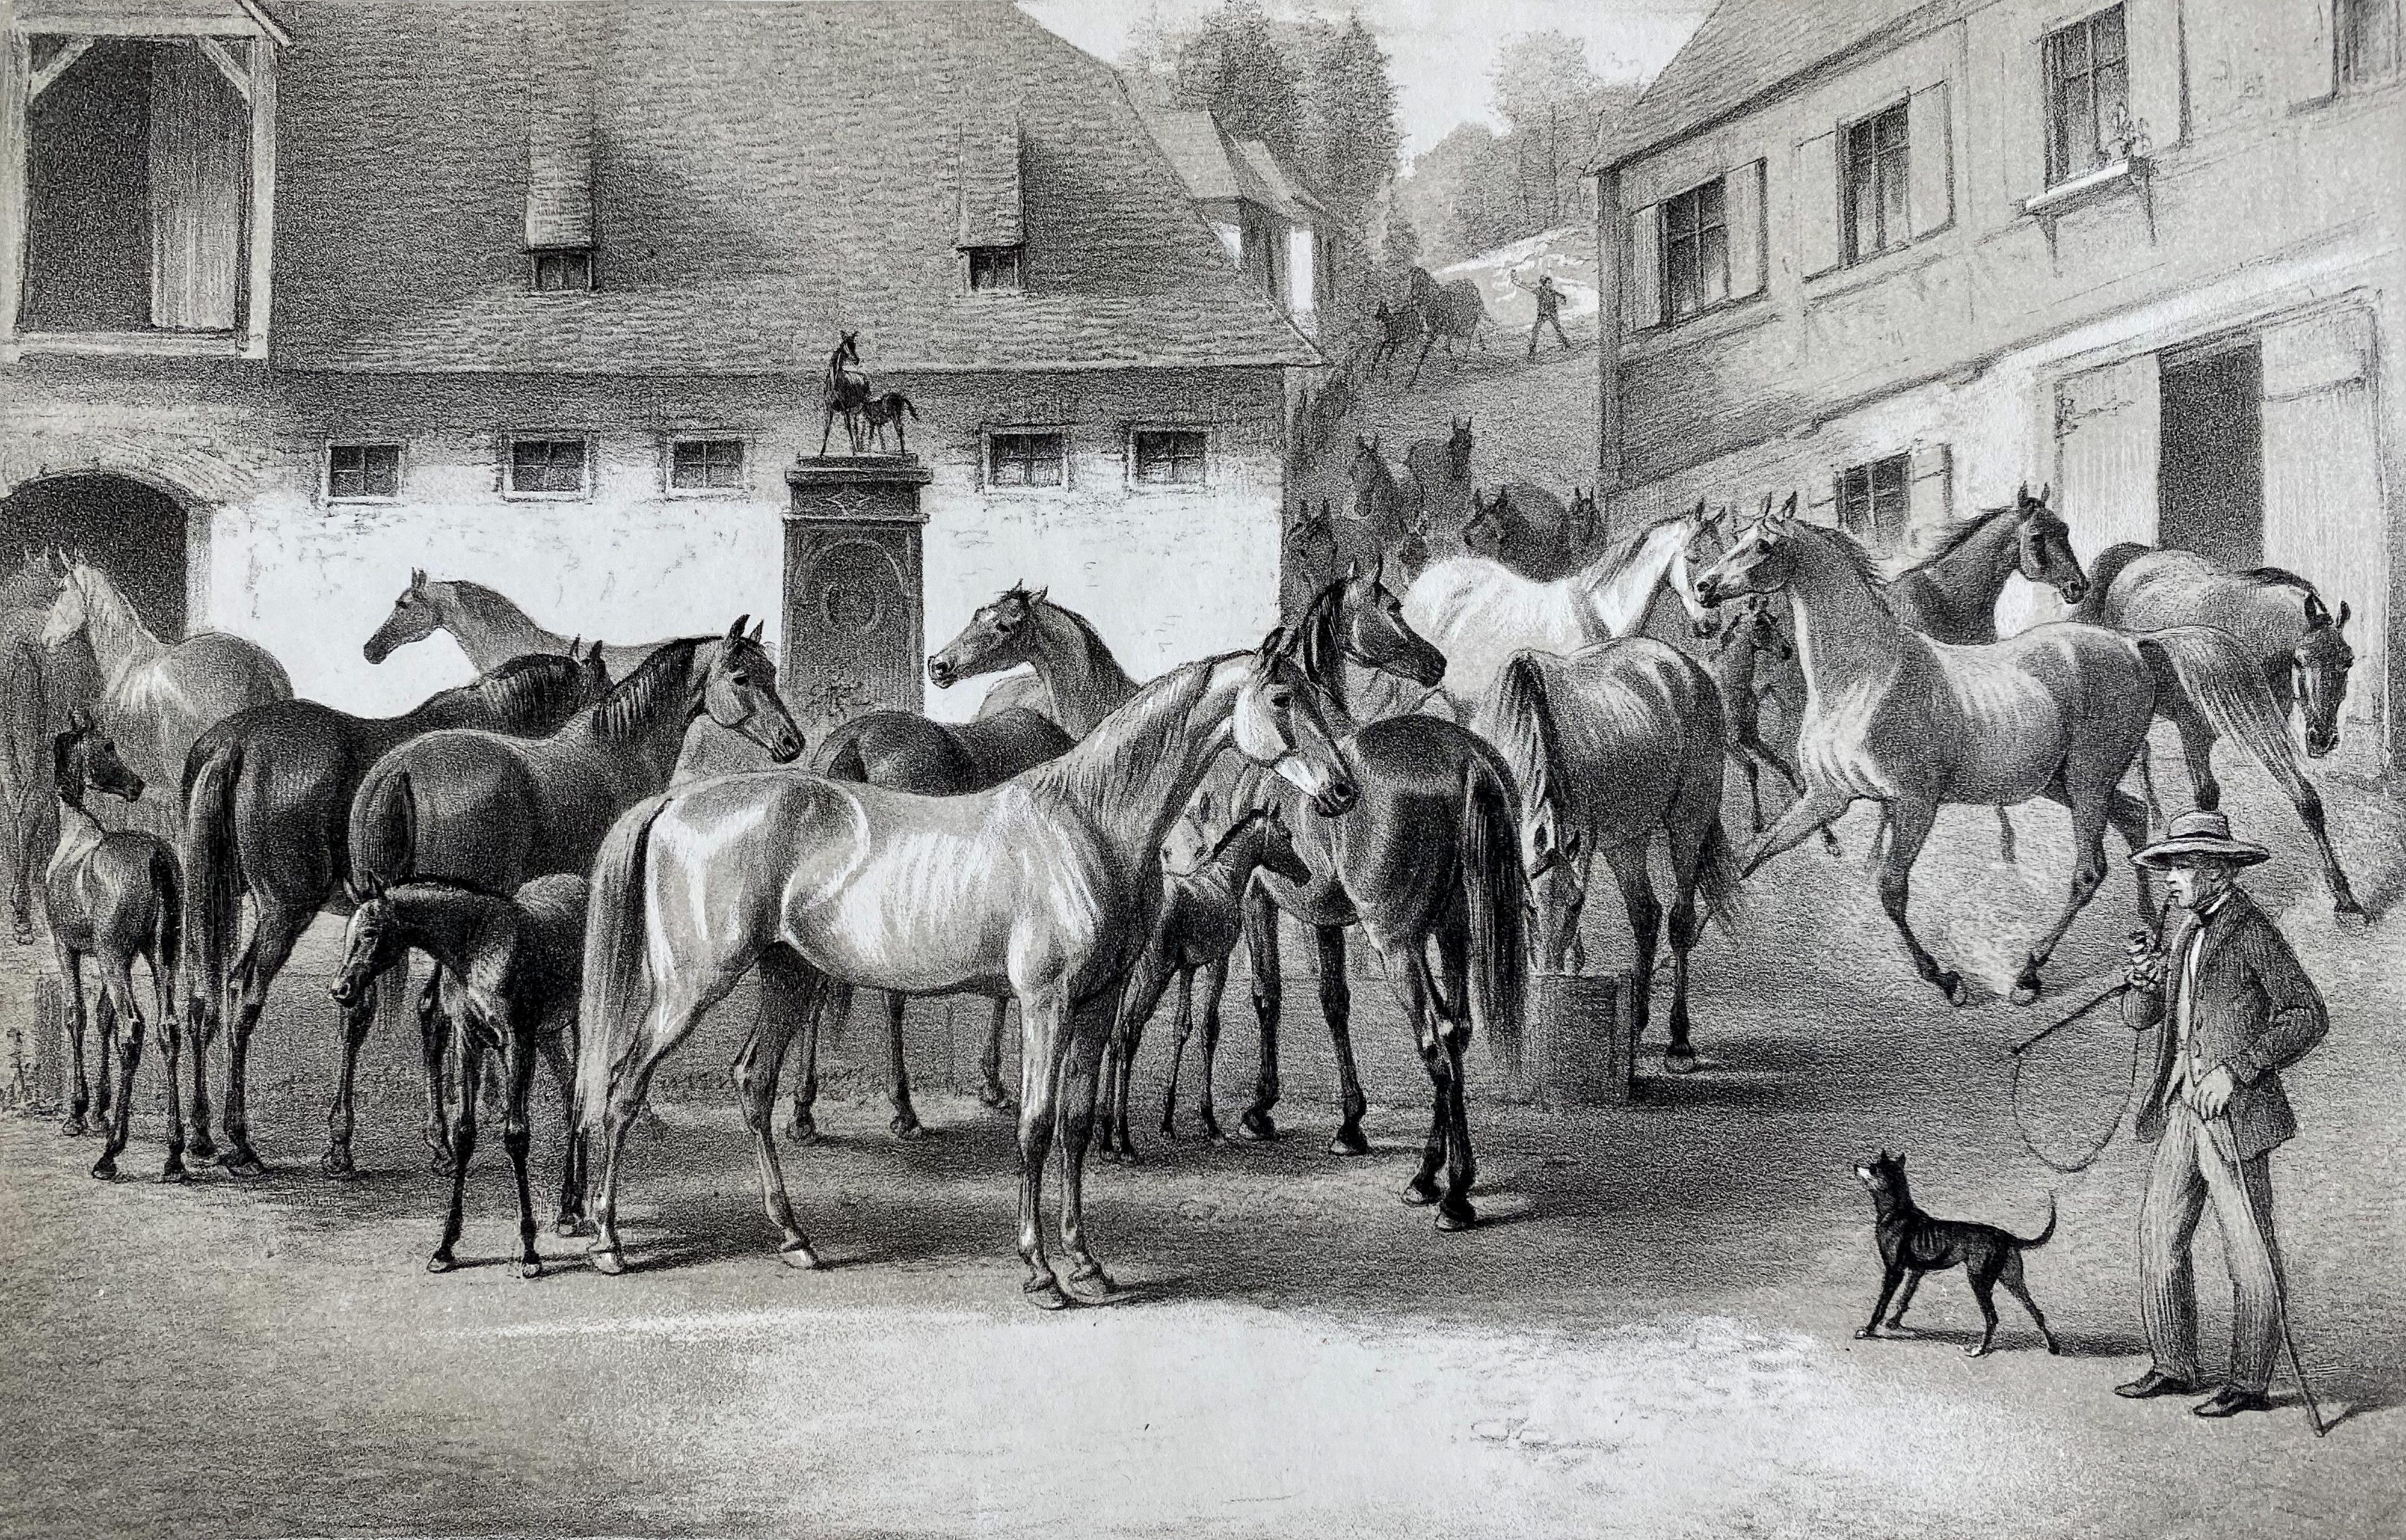 Gestütshof Marbach an der Lauter 1857